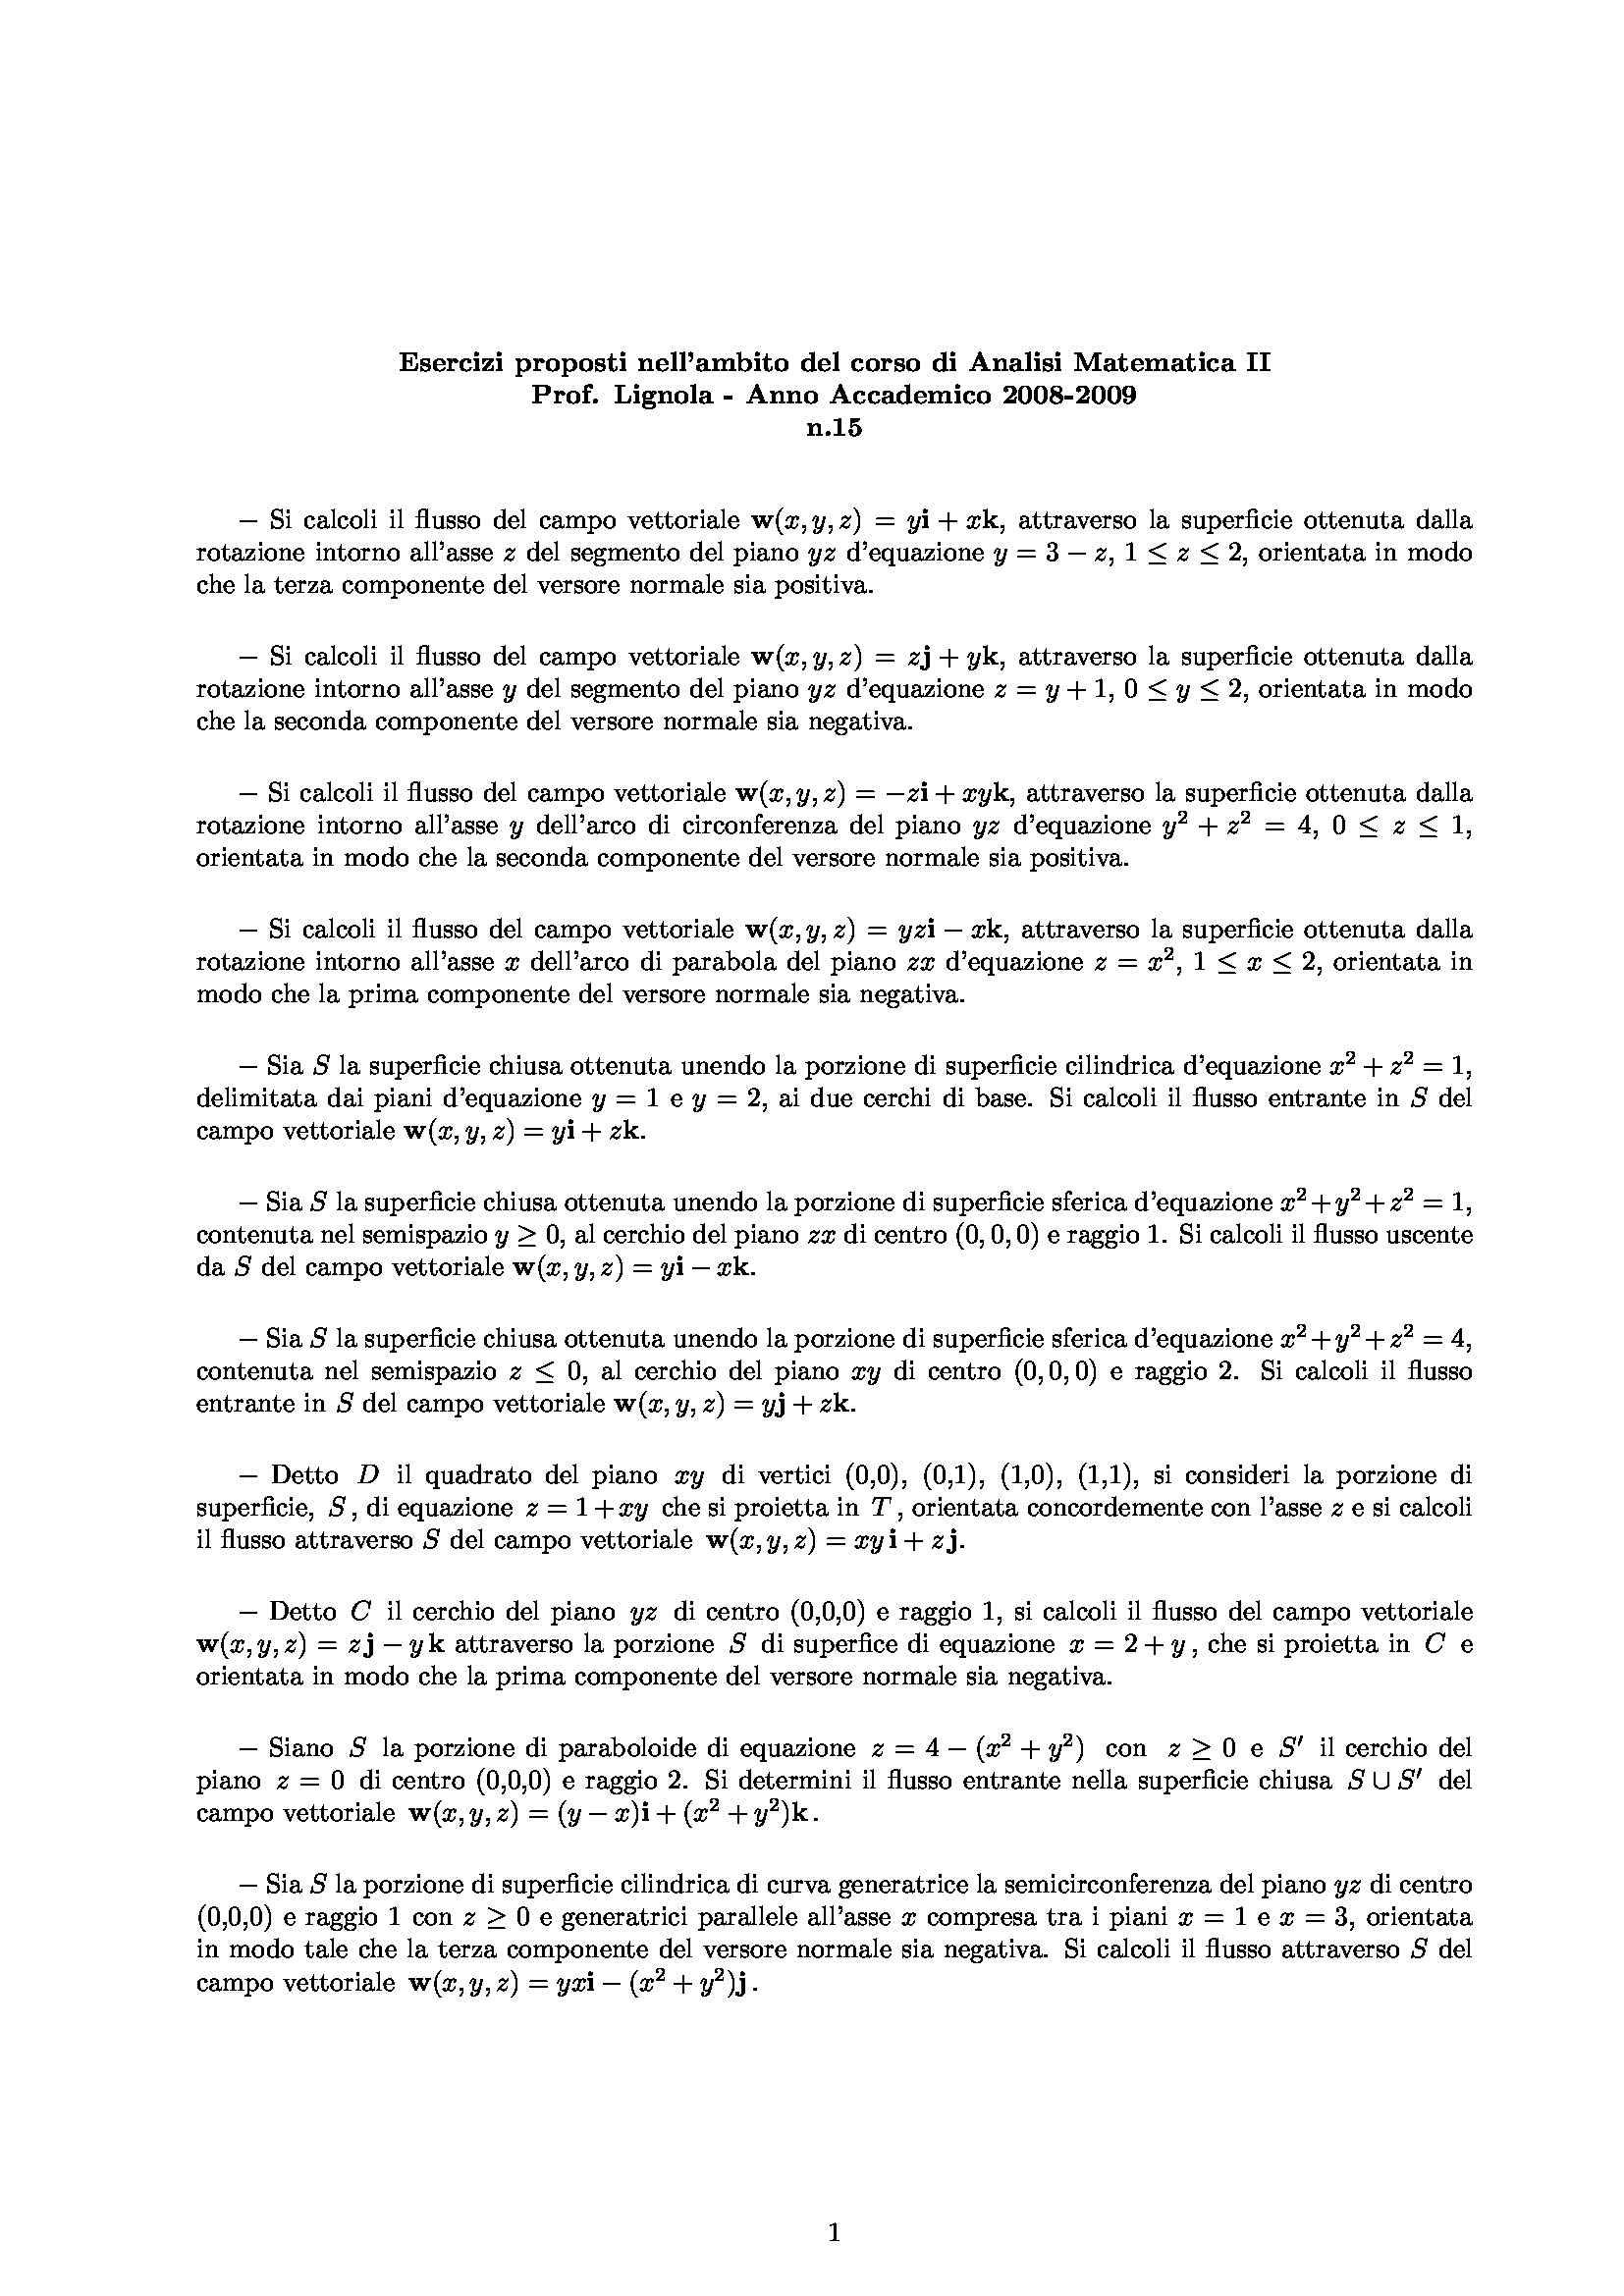 Analisi matematica II - Esercizio 13